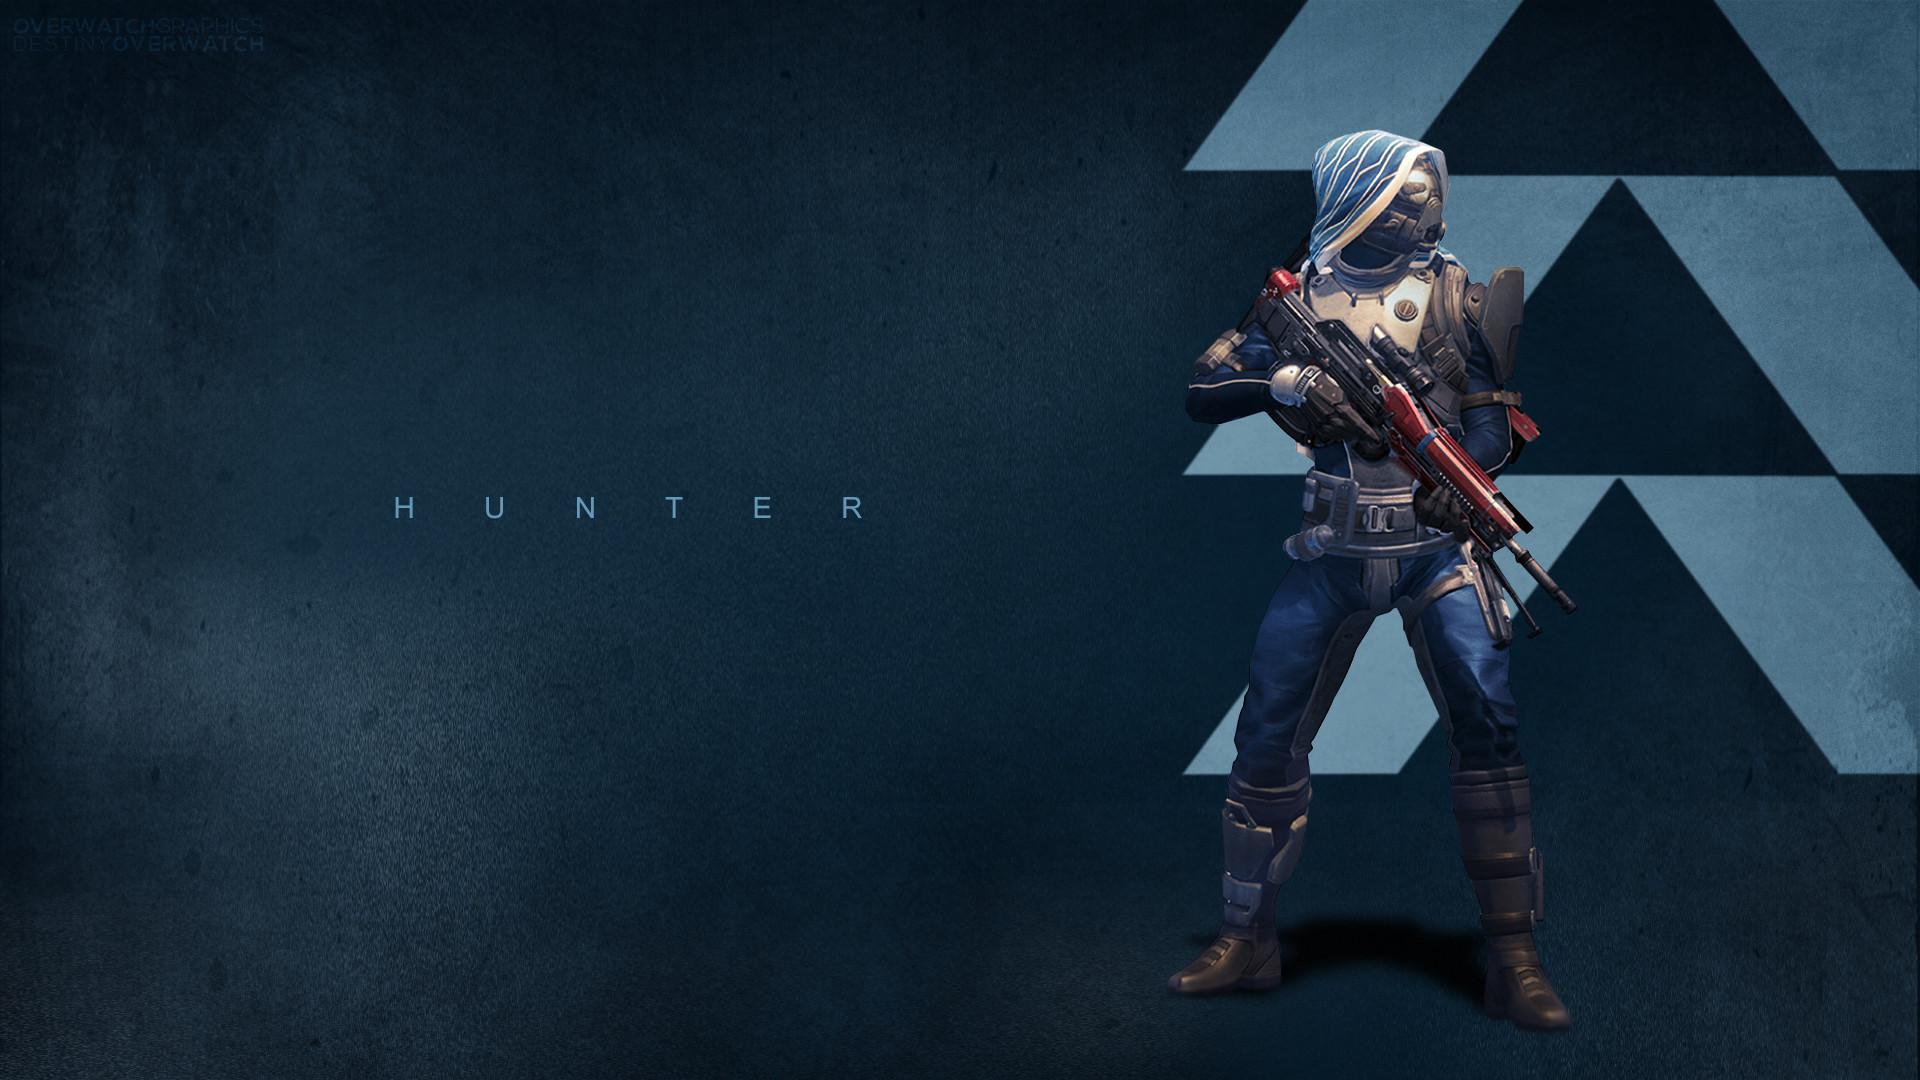 DeviantArt: More Like Destiny – Hunter Wallpaper by OverwatchGraphics